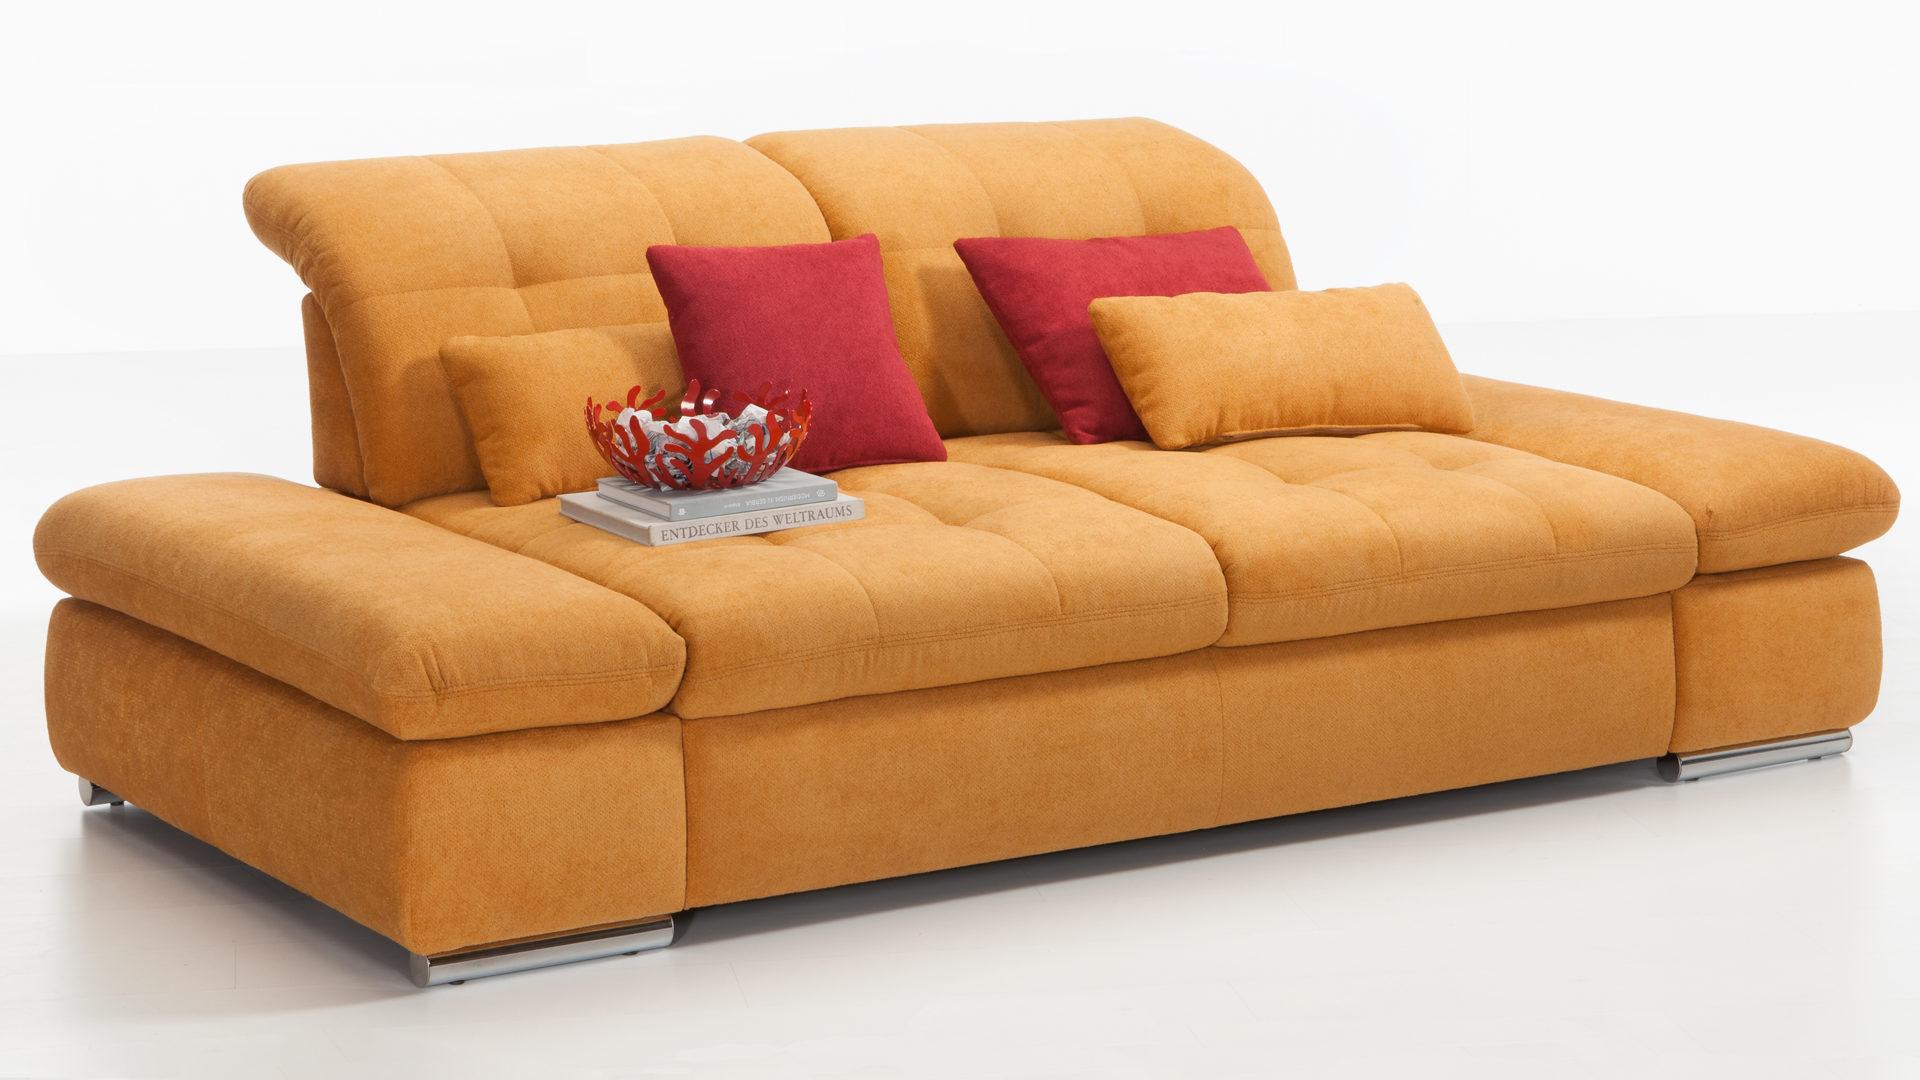 Kawoo 2 Sitzer Sofa Santa Lucia Mit Federkern Maisfarbener Bezug Kati 20387 Verchromte Metallfusse Breite Ca 225 Cm